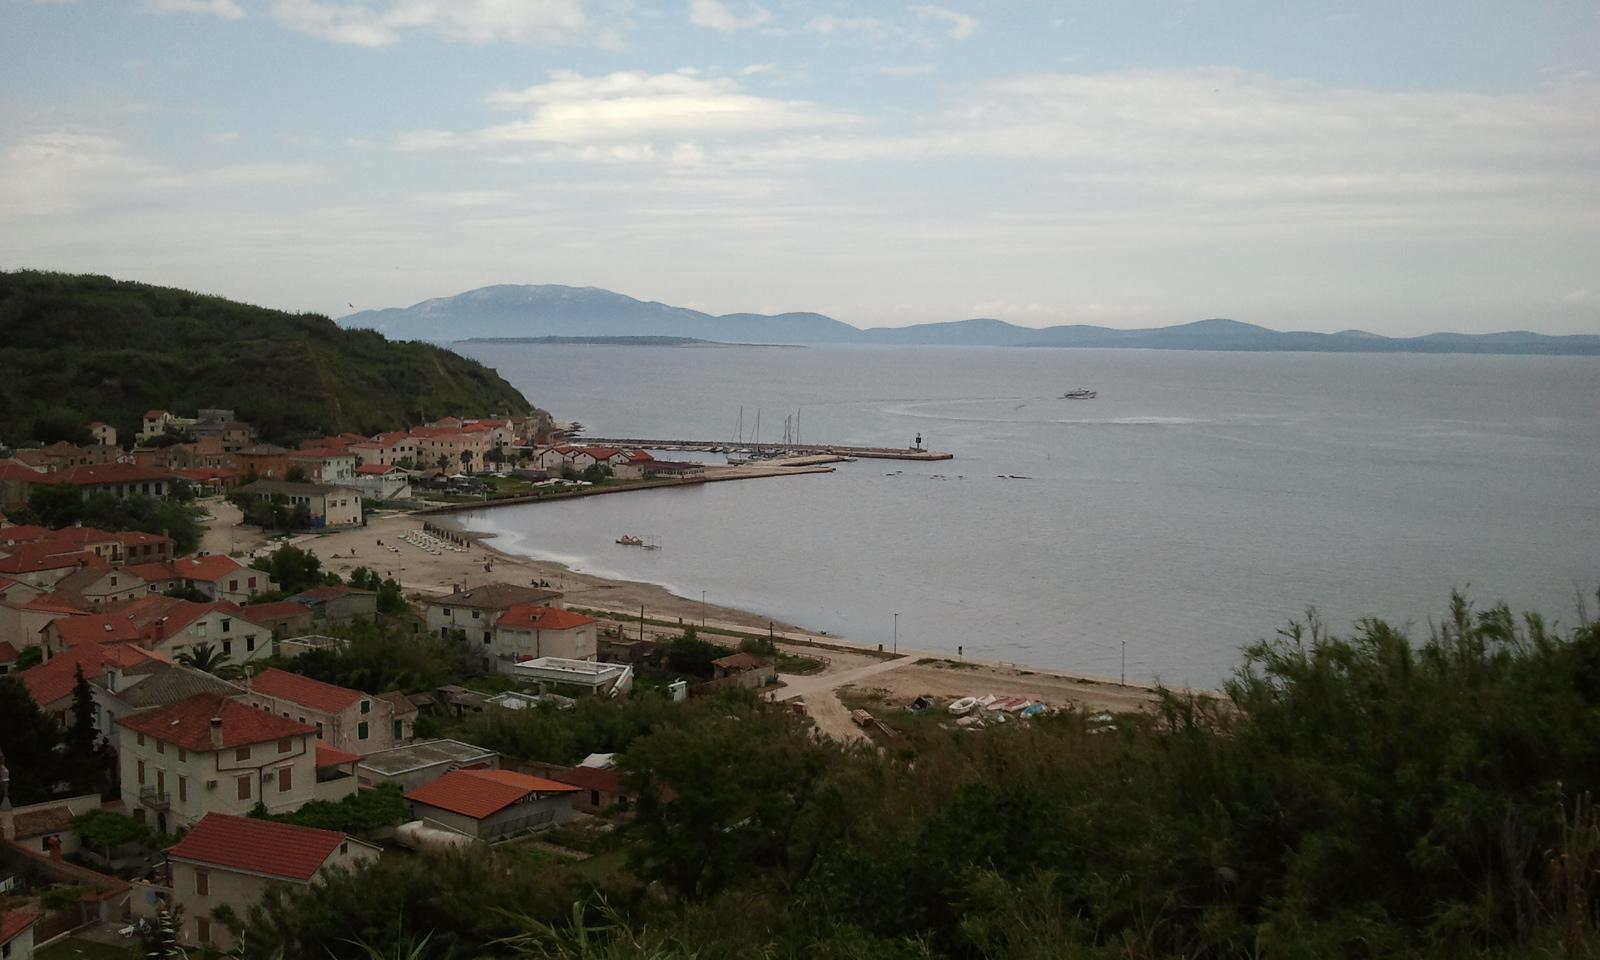 Noleggio Barche Isola di Susak - Navalia | Noleggia un Sogno